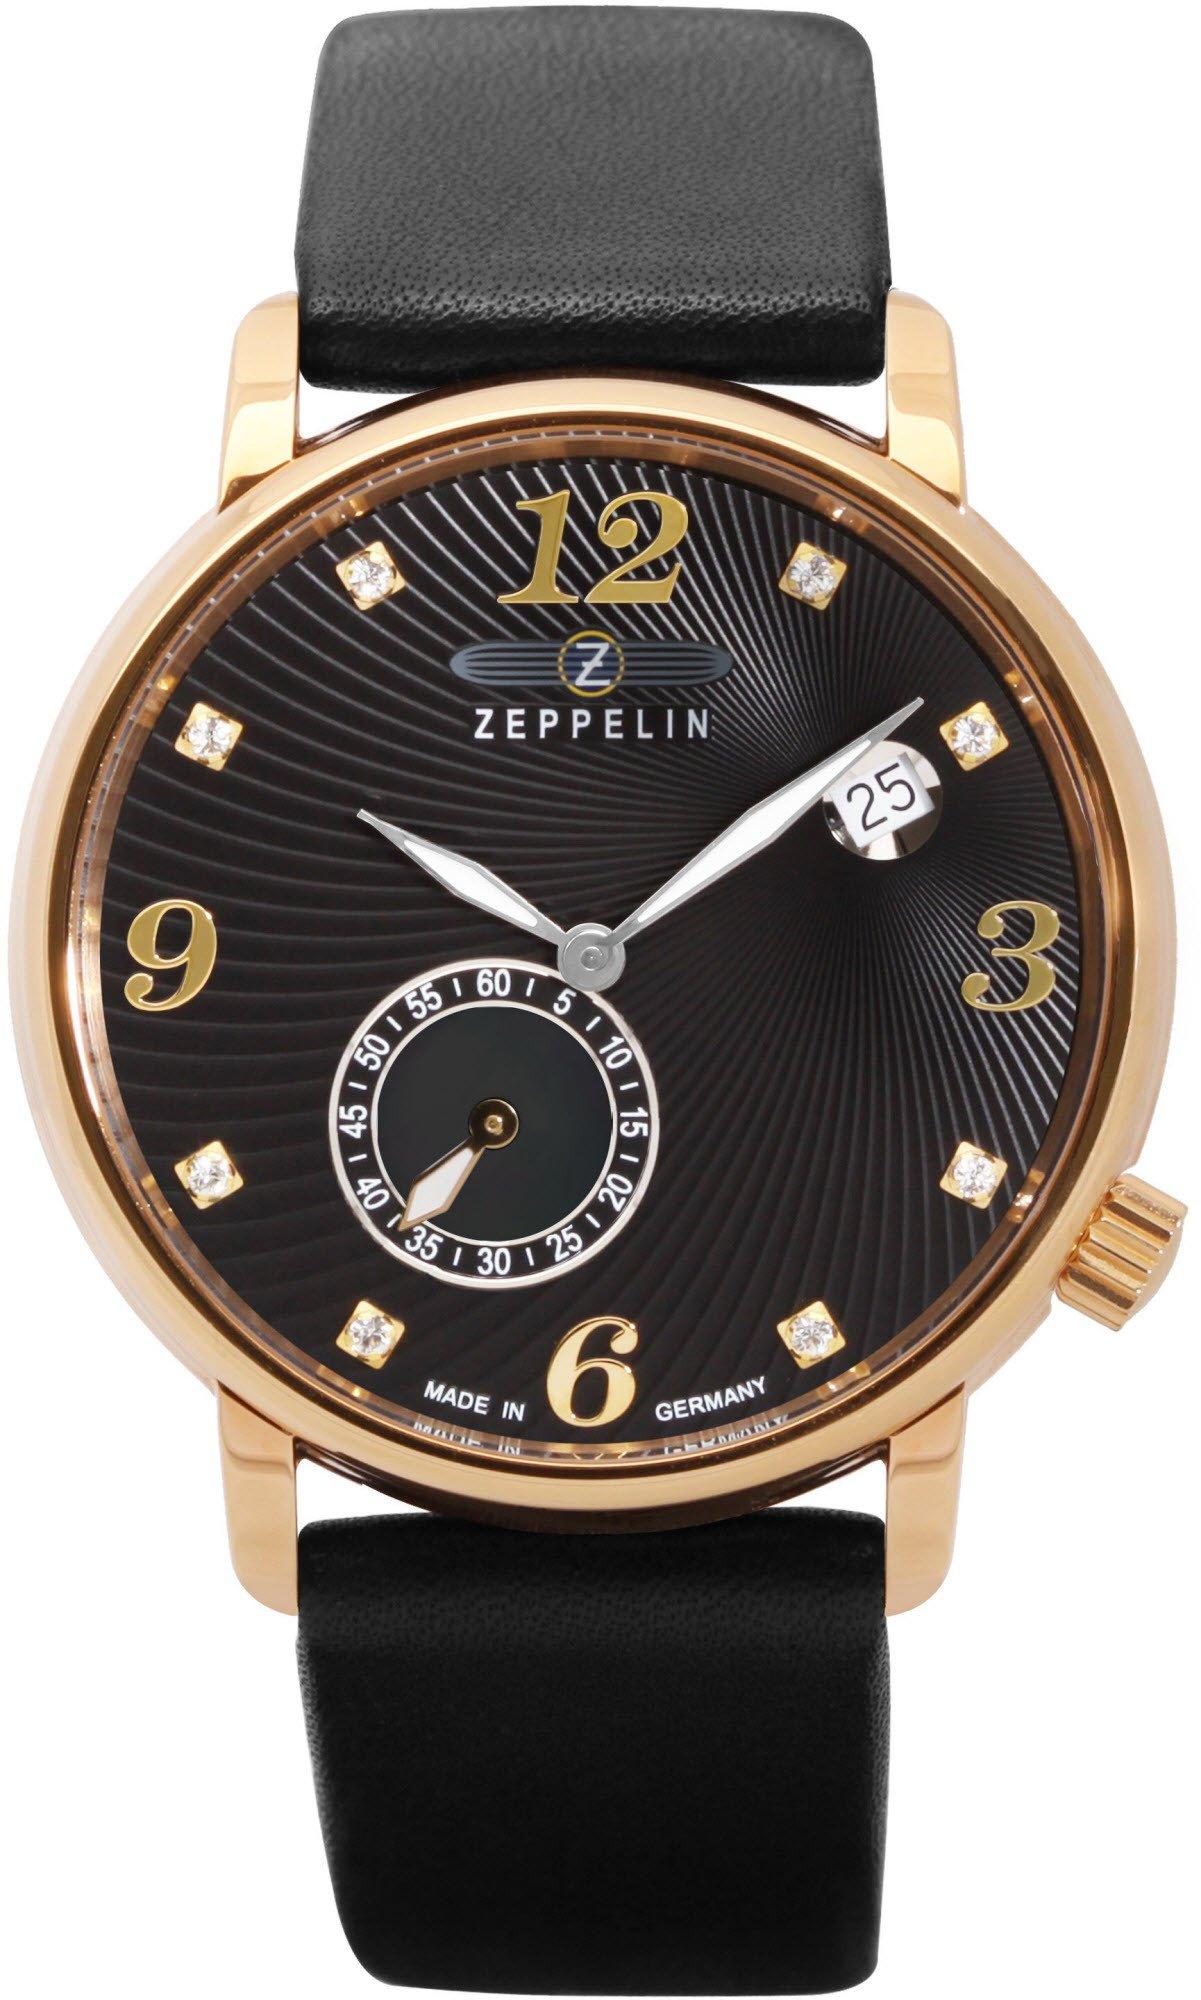 Zeppelin 7633-2 Luna 35mm Quartz Watch, Ronda 6004.D, 50M WR, MOP Dial, Swarovski Crystals, Leather Strap £133.50 @ Amazon